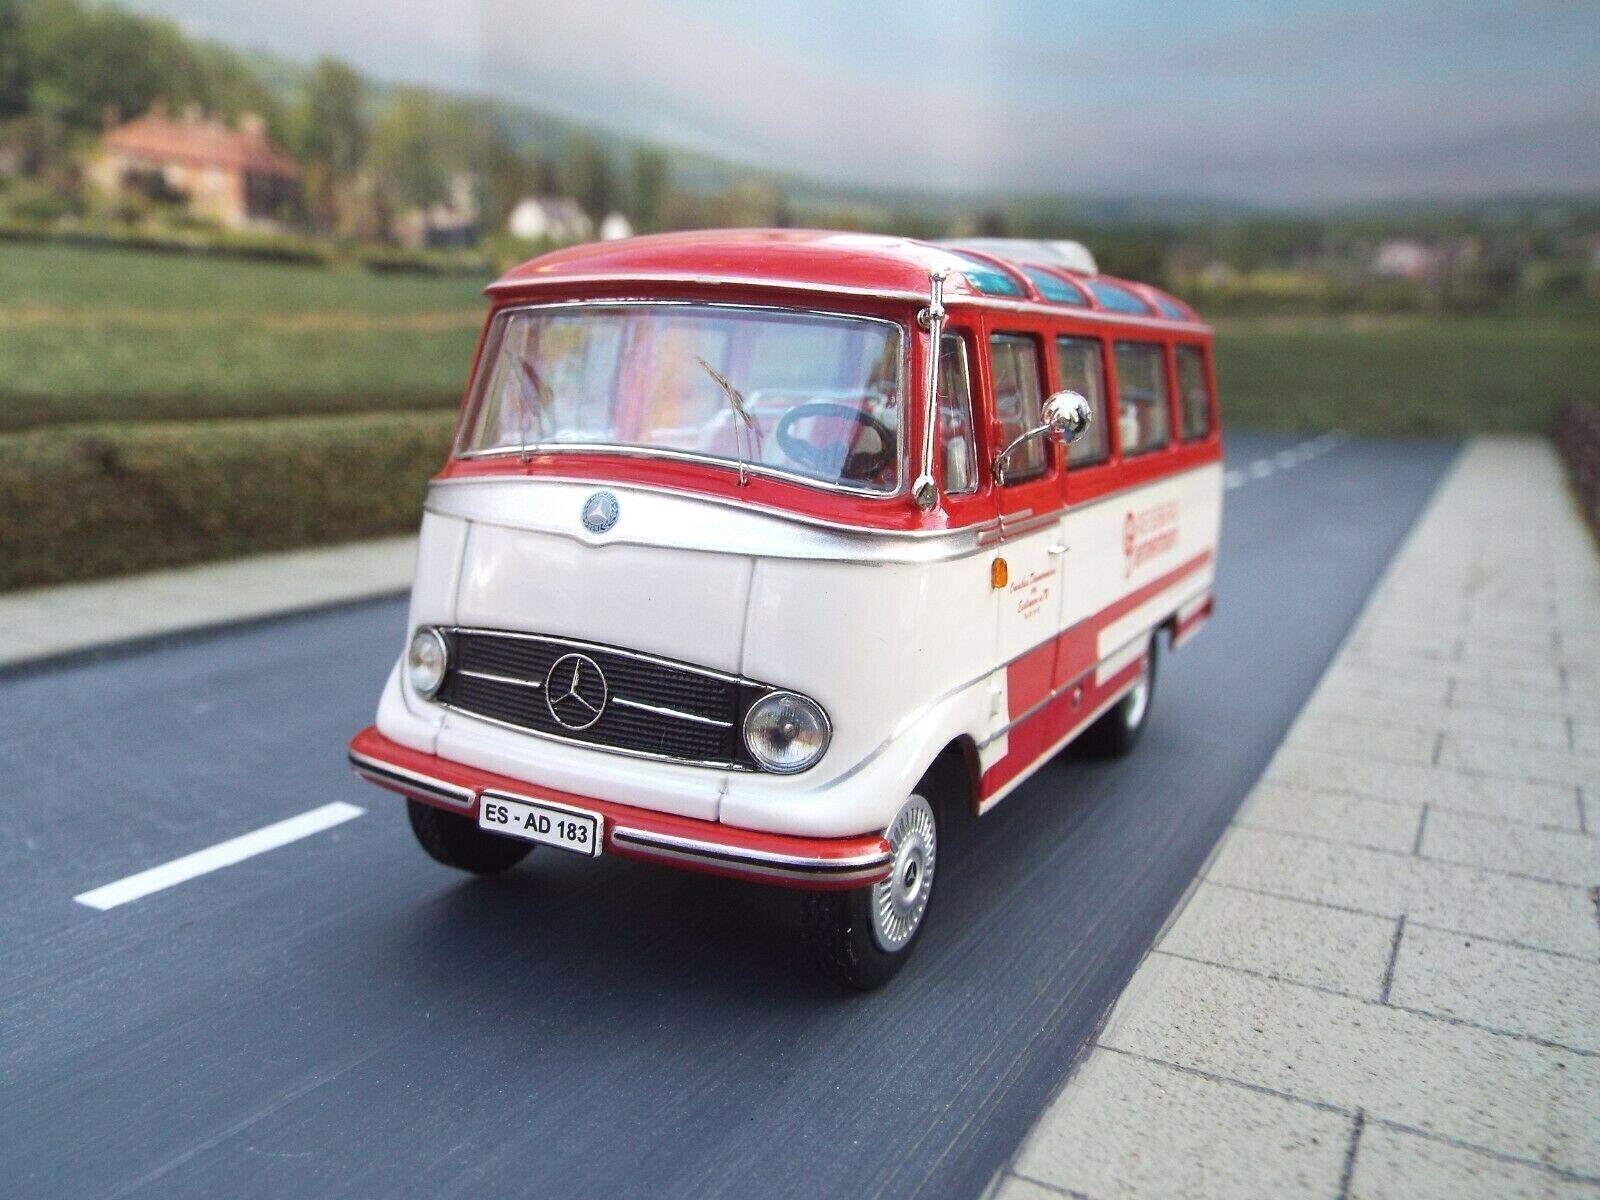 1 43 Scale Mercedes Benz 0319 Bus (red   white) by Schuco Art.no 450281900